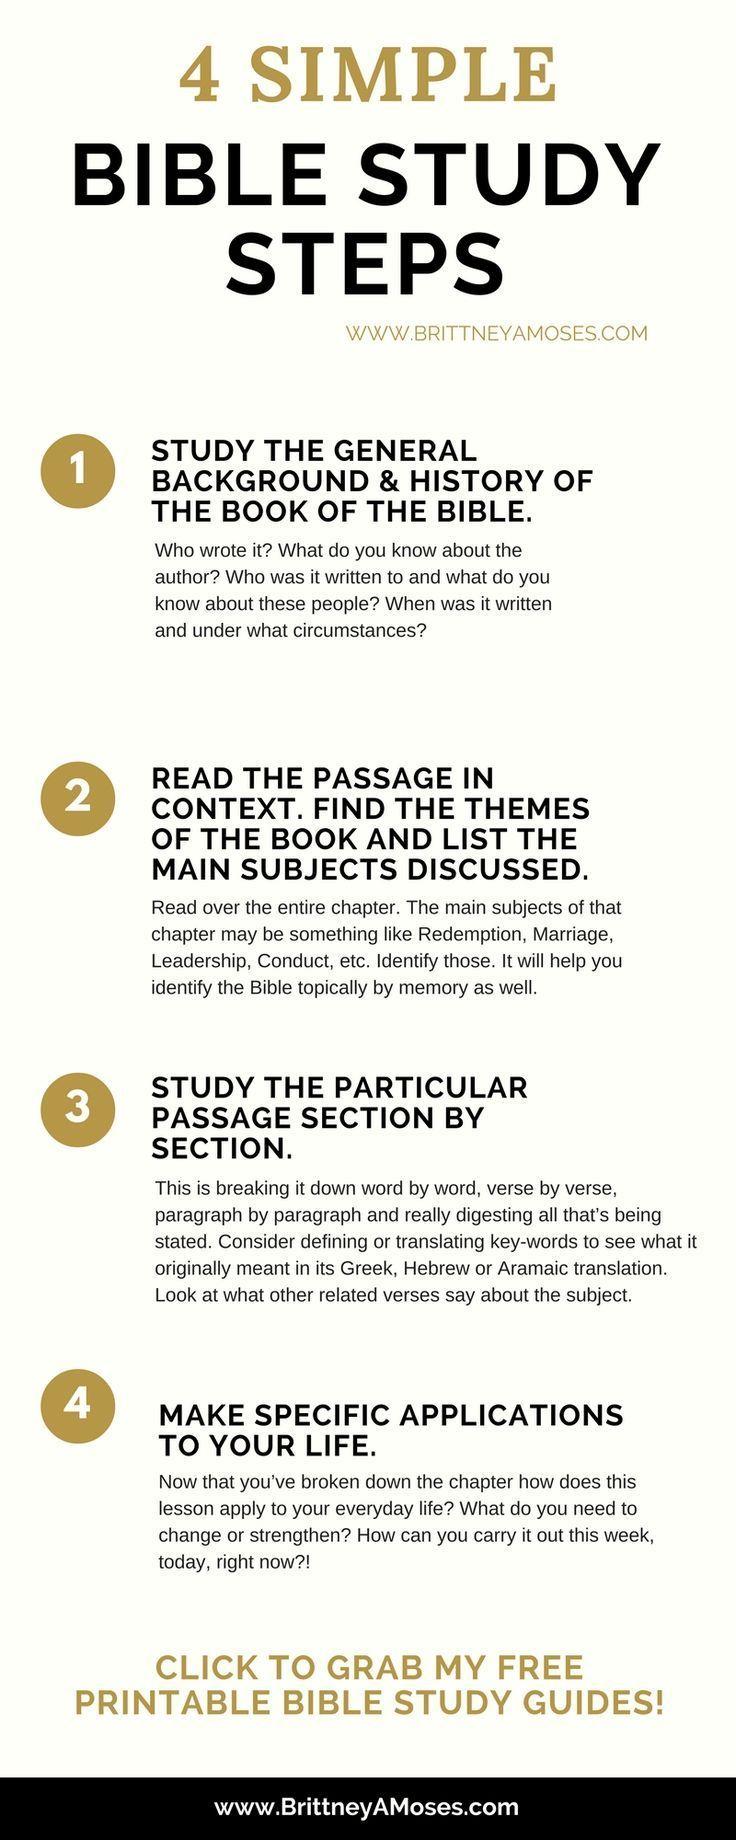 4 Simple Bible Study Steps | Bible study plans, Bible ...